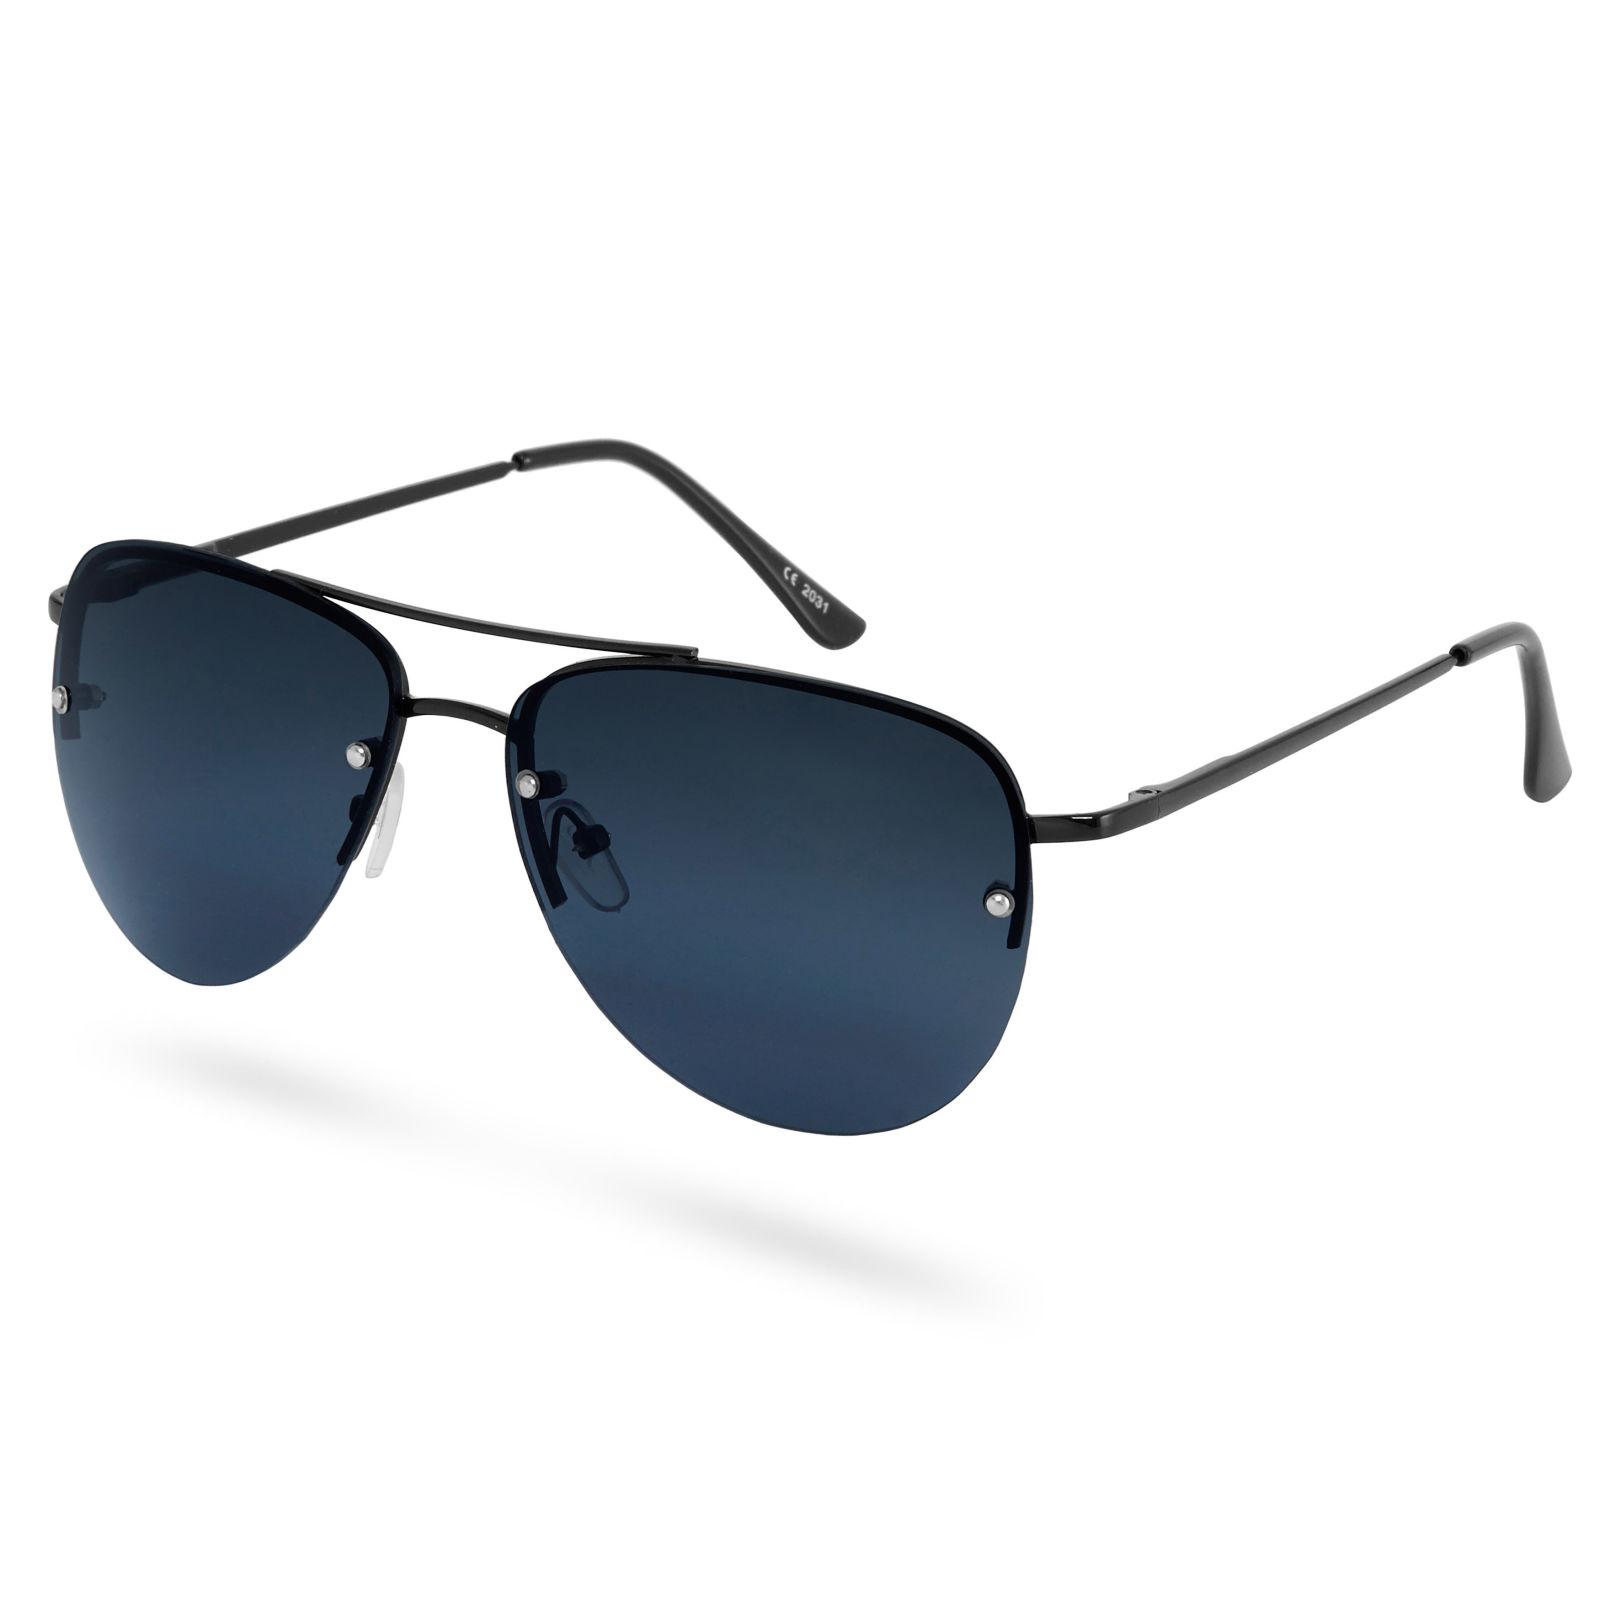 Paul Riley Čierne dymové slnečné okuliare Aviator Total - Glami.sk 7c1391af468